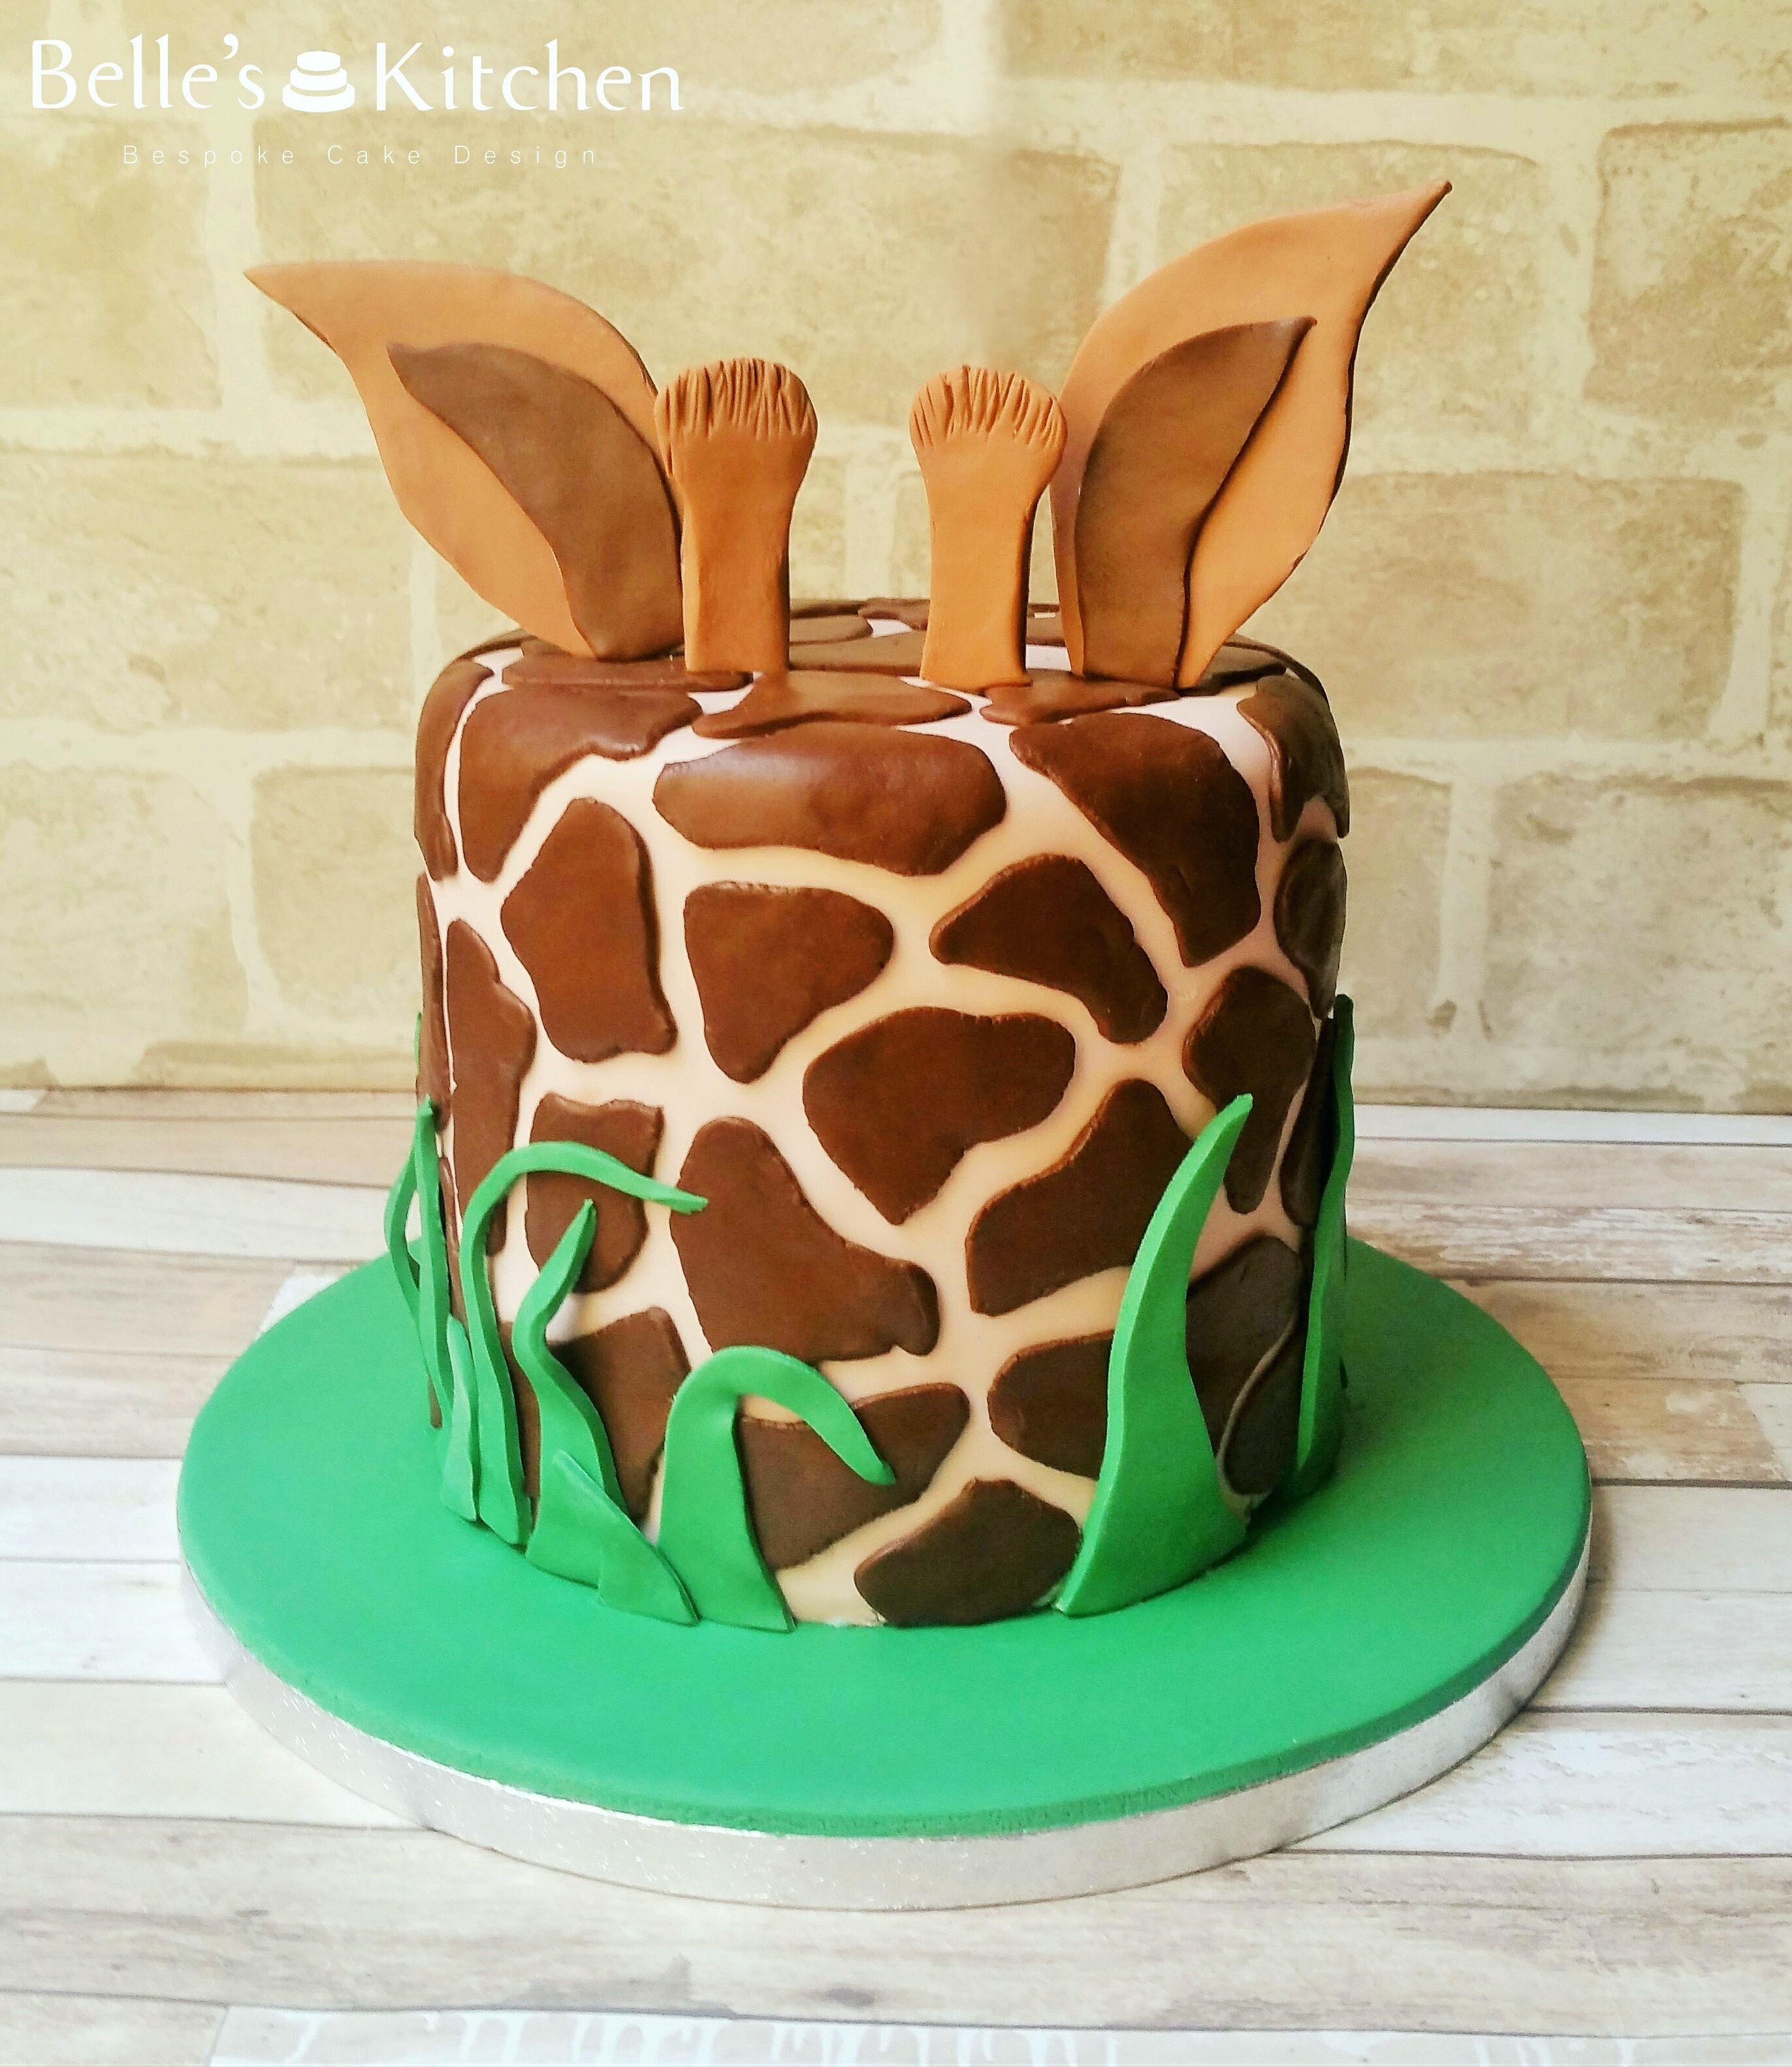 Giraffe Cake Cake decor Pinterest Giraffe cakes Giraffe and Cake